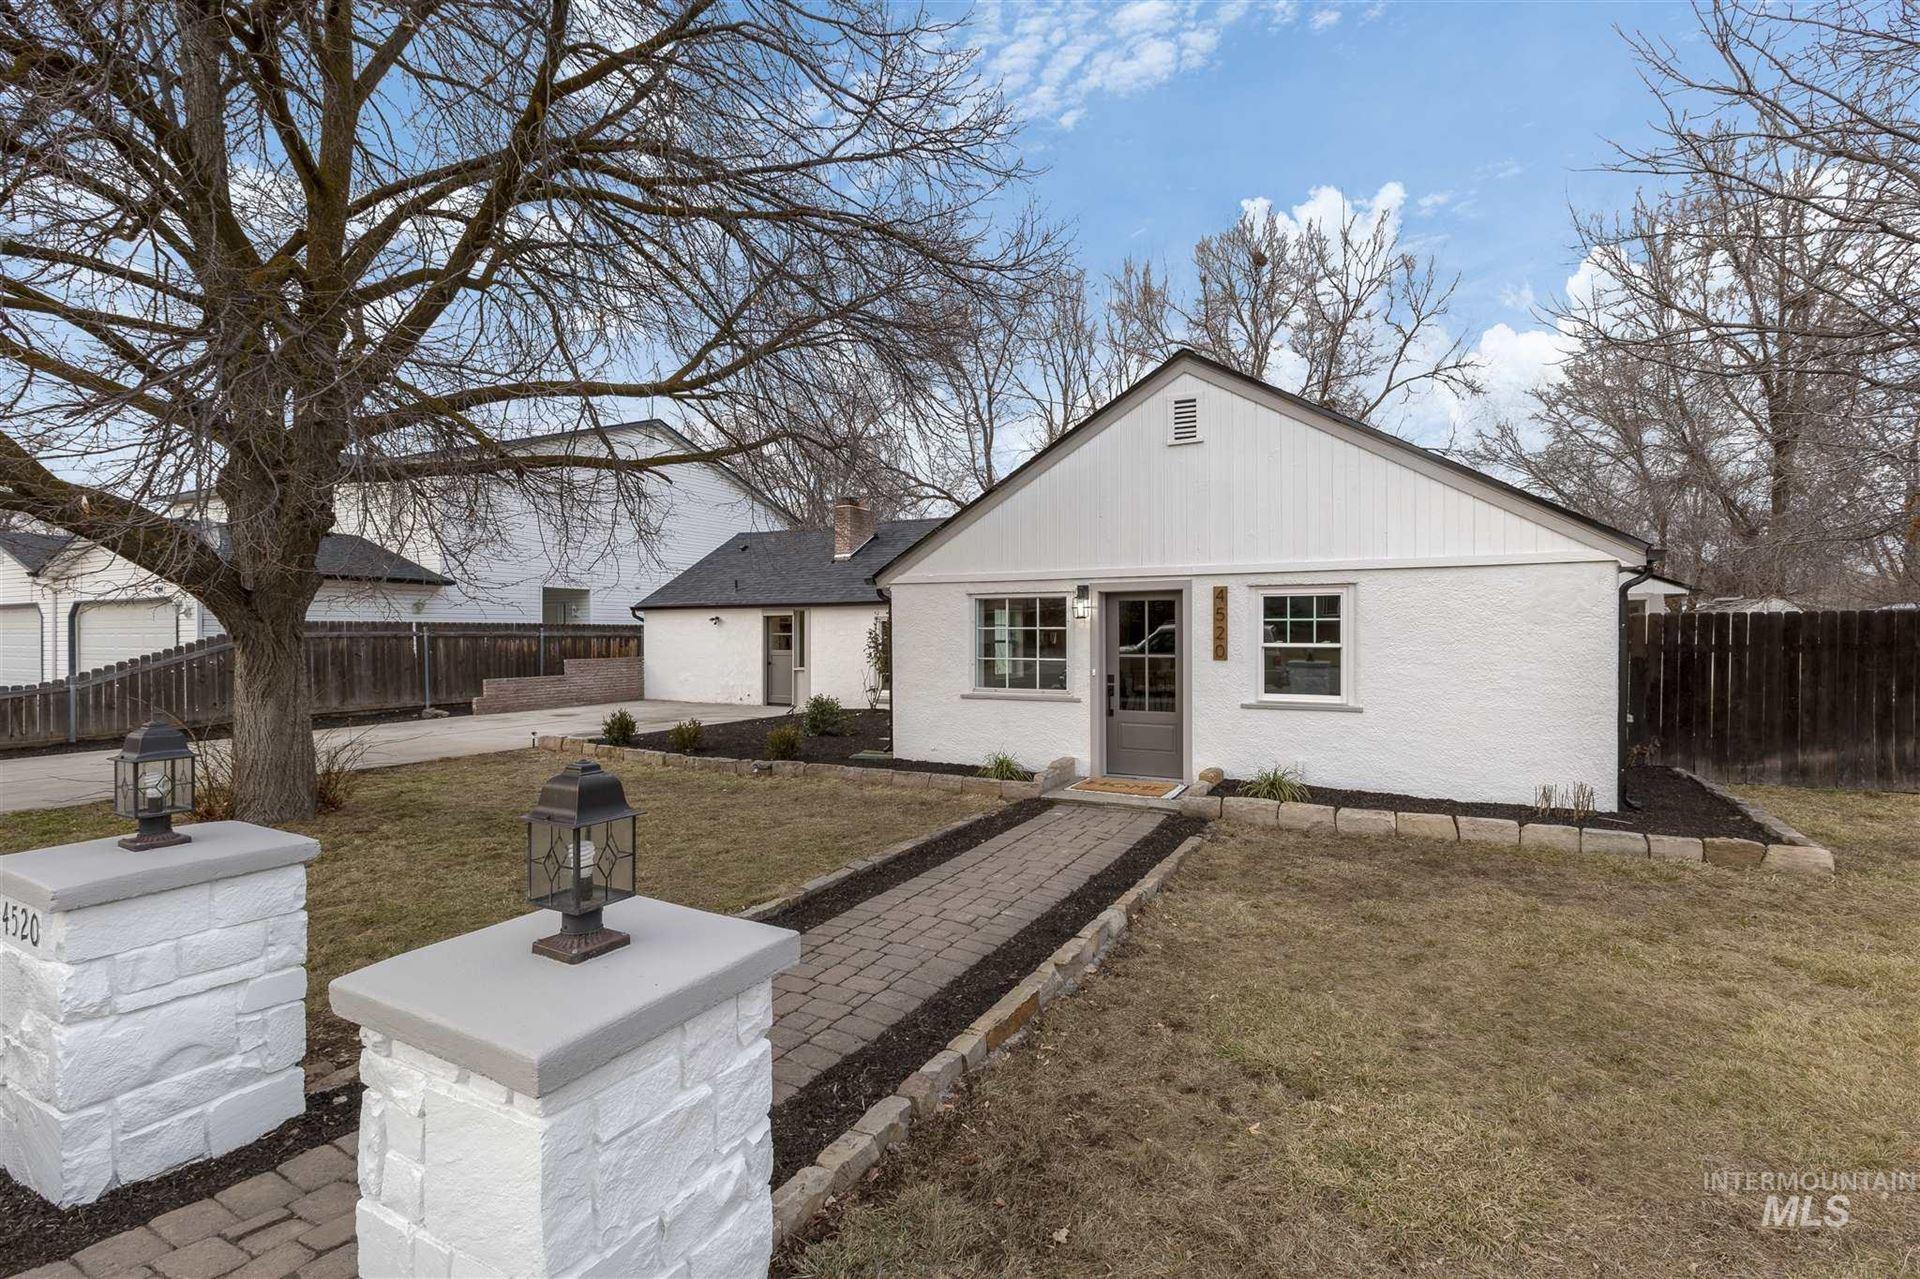 Photo of 4520 W Kootenai St, Boise, ID 83705 (MLS # 98791491)